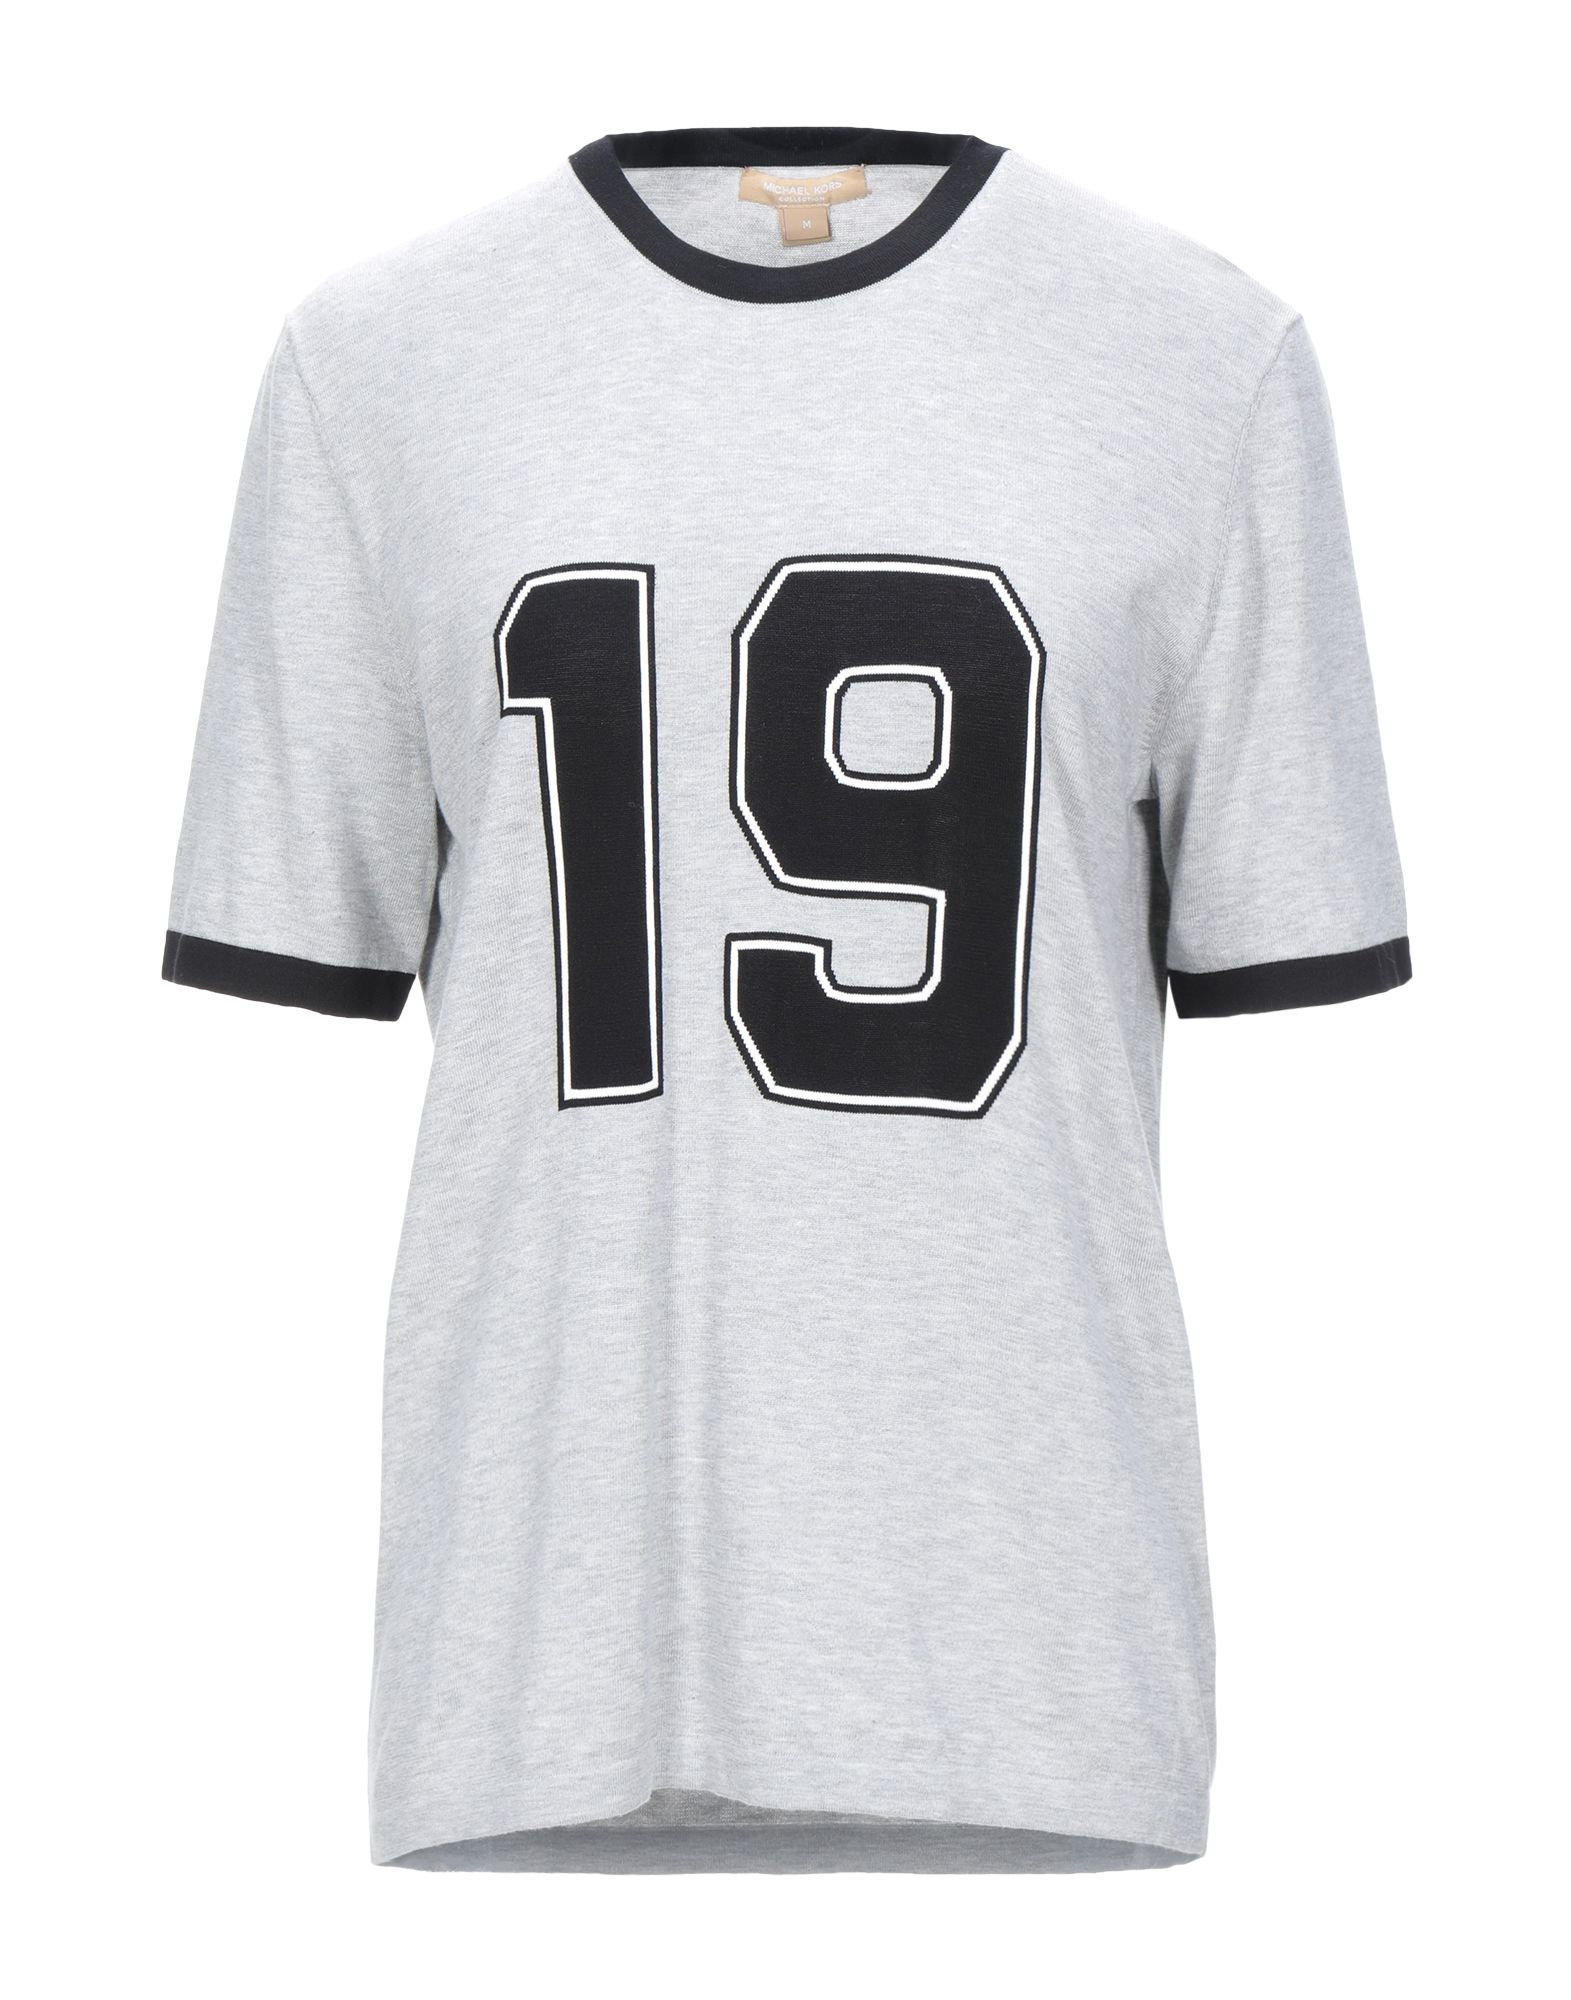 Фото - MICHAEL KORS COLLECTION Футболка michael kors collection юбка длиной 3 4